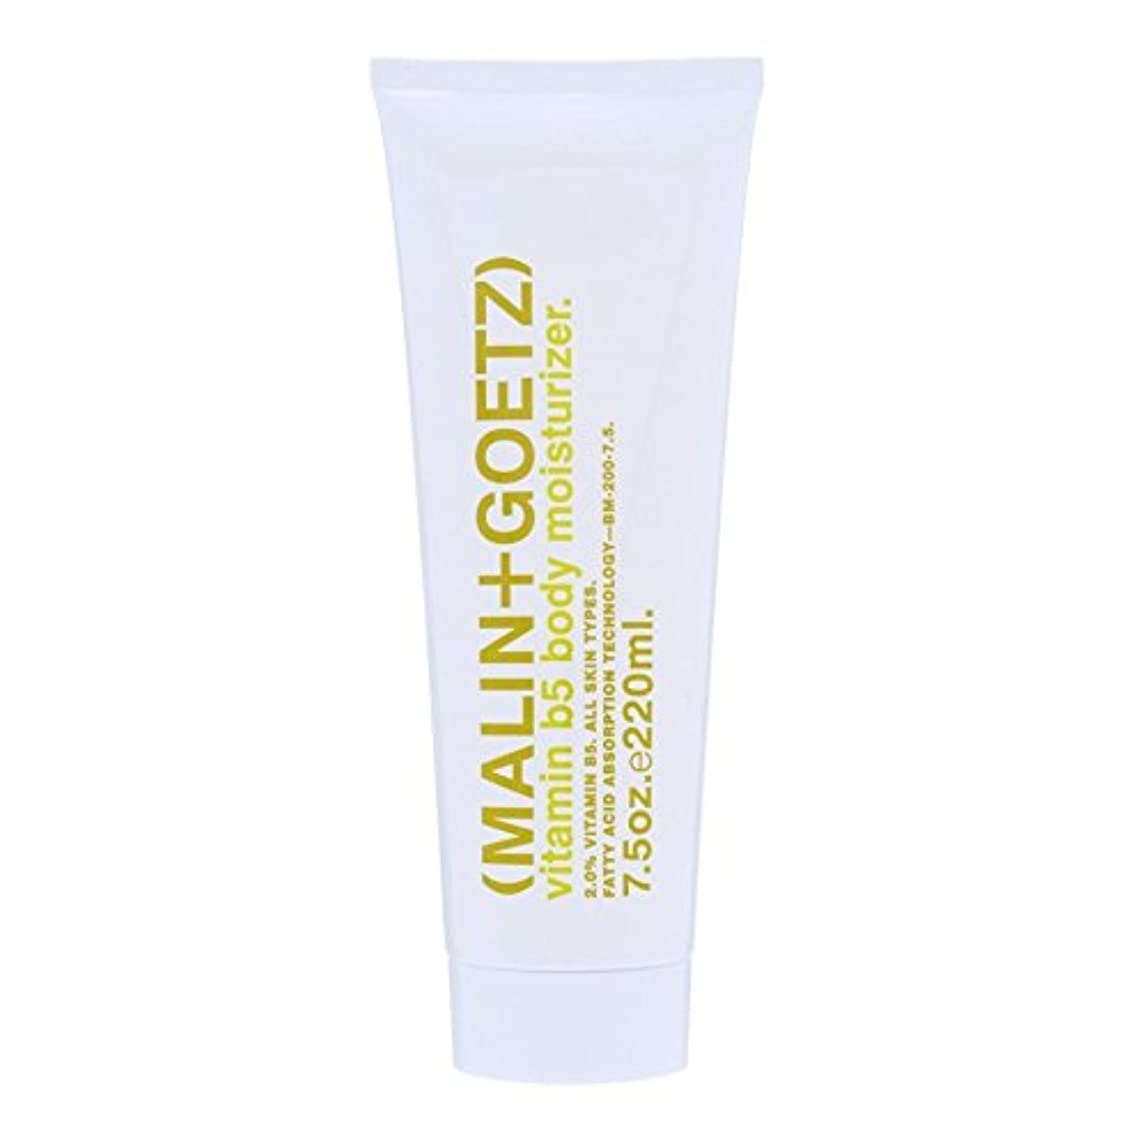 (MALIN+GOETZ) Vitamin B5 Body Moisturiser 220ml - (マリン+ゲッツ)ビタミン5ボディモイスチャライザーの220ミリリットル [並行輸入品]